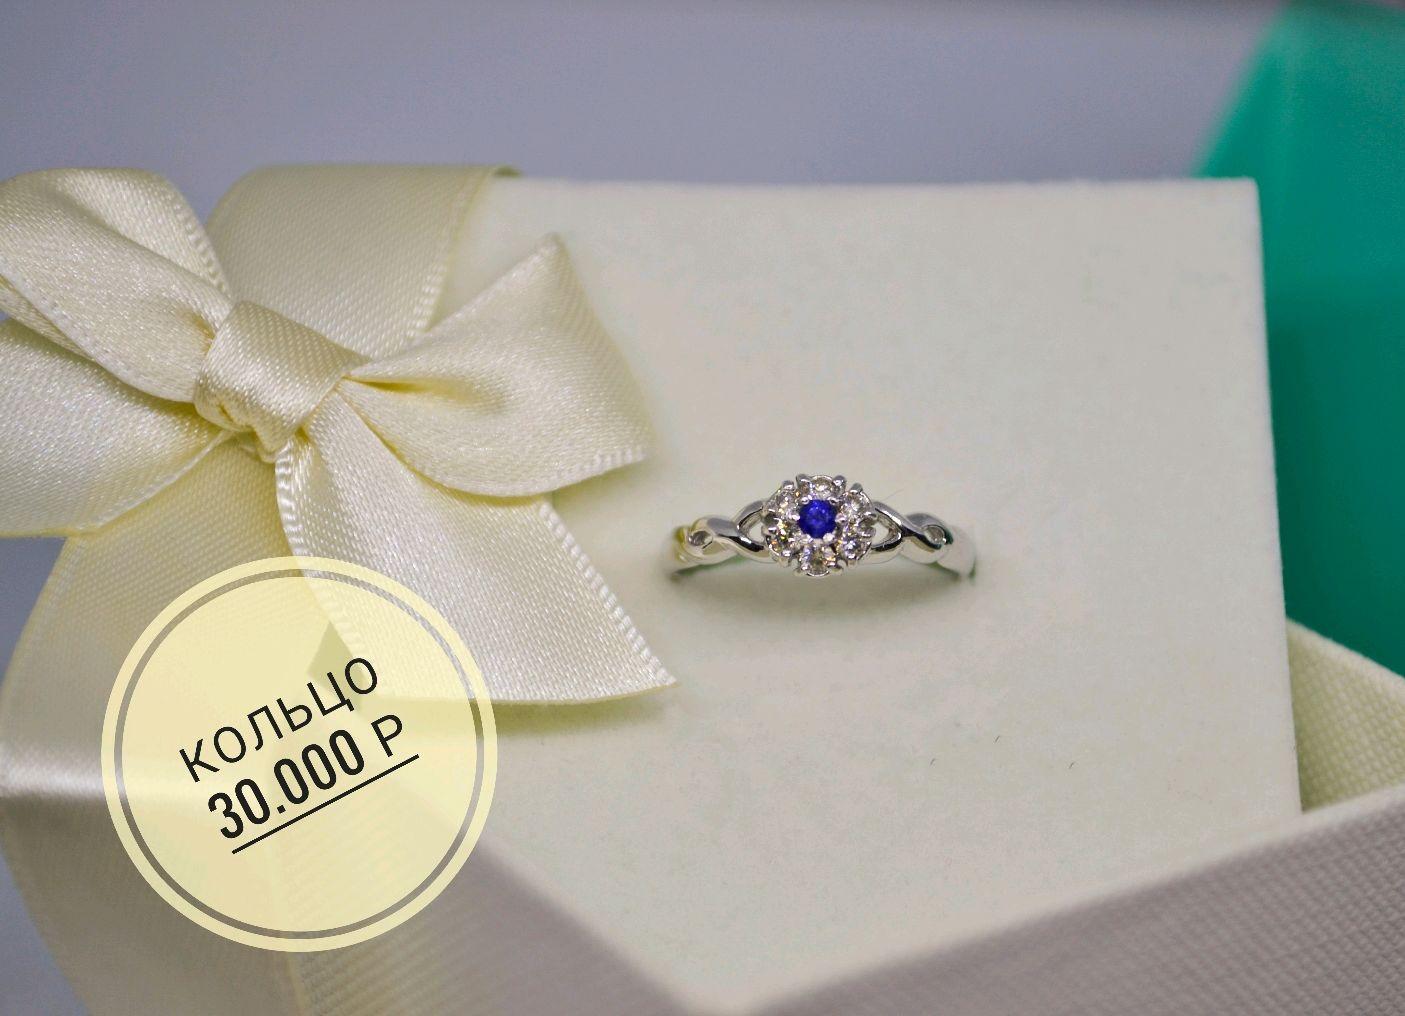 Кольцо из белого золота с сапфиром и бриллиантами, Кольца, Кострома, Фото №1